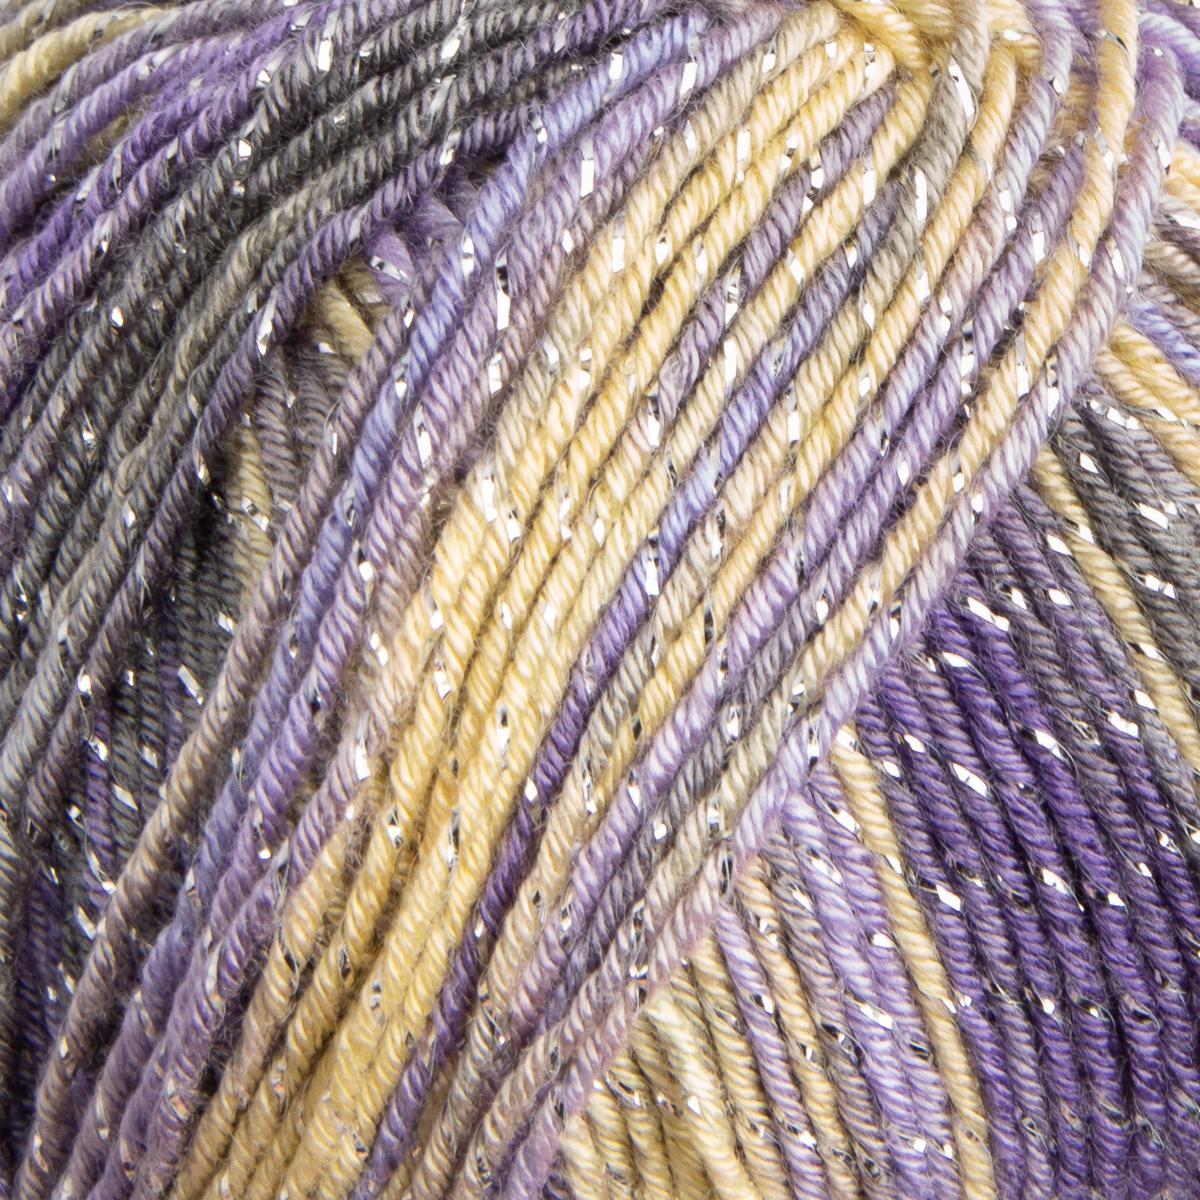 3pk-Premier-Yarns-Wool-Free-Lace-Acrylic-Yarn-Super-Fine-1-Knitting-Skeins-Soft thumbnail 12